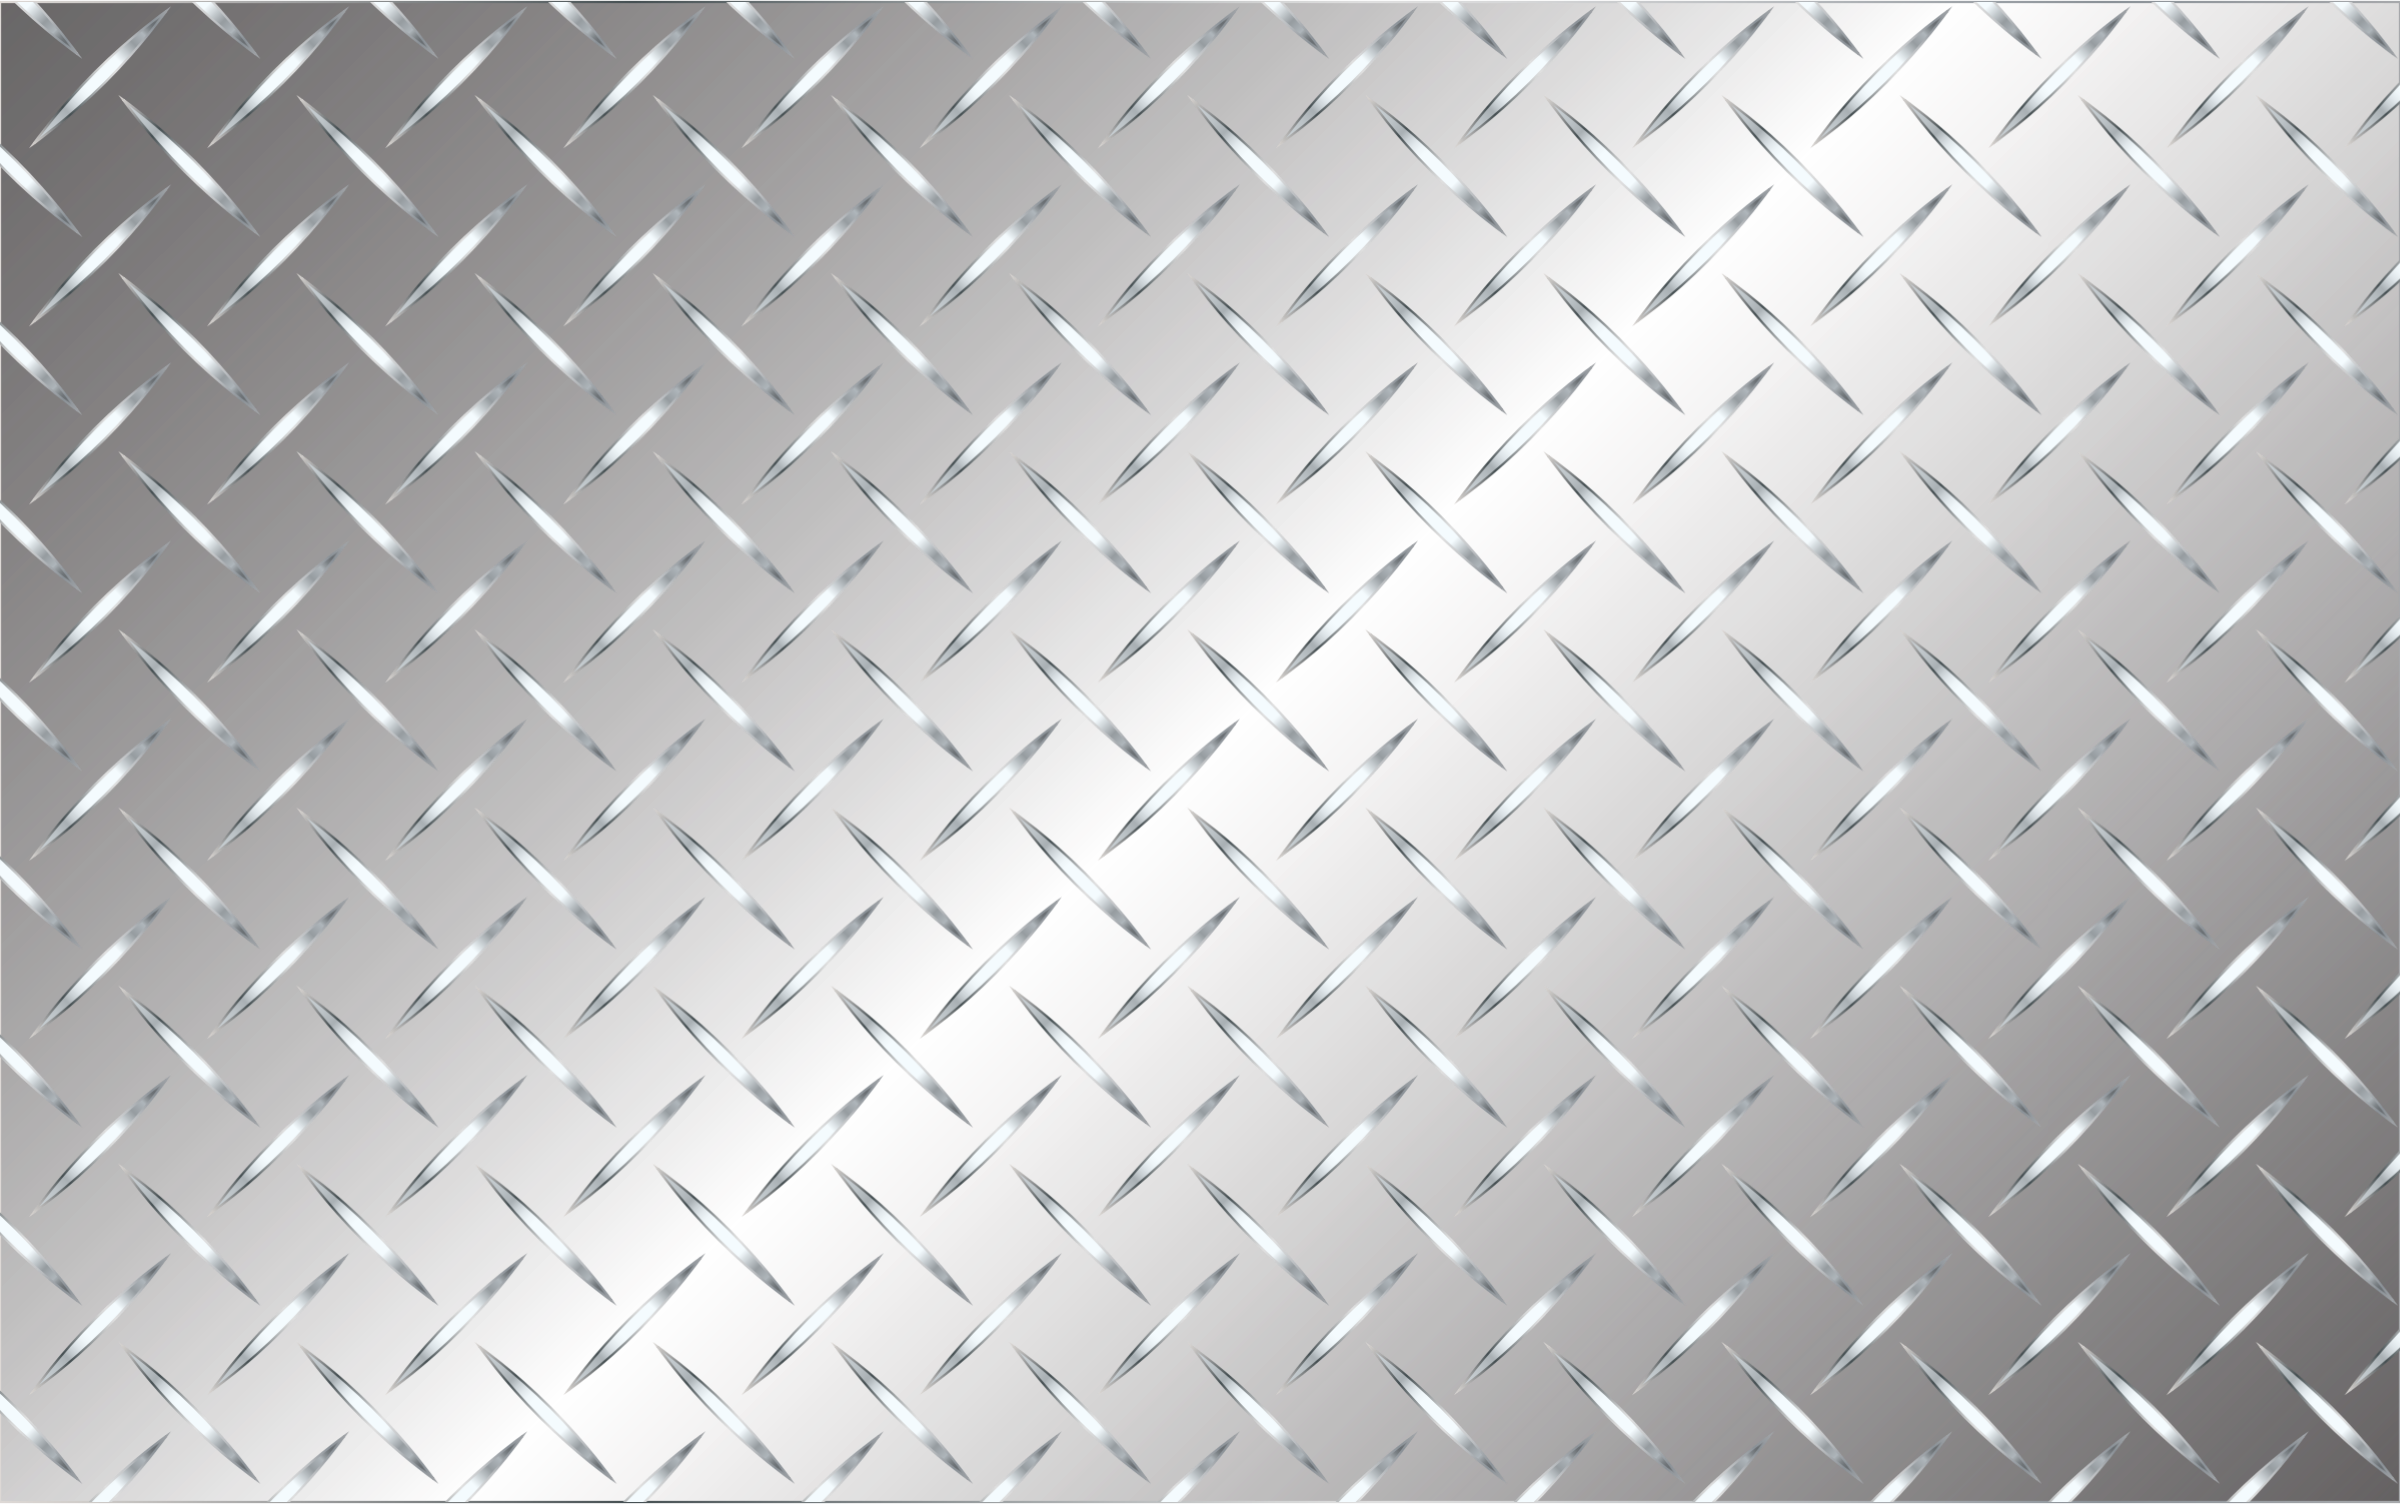 Texture clipart steel pattern #15